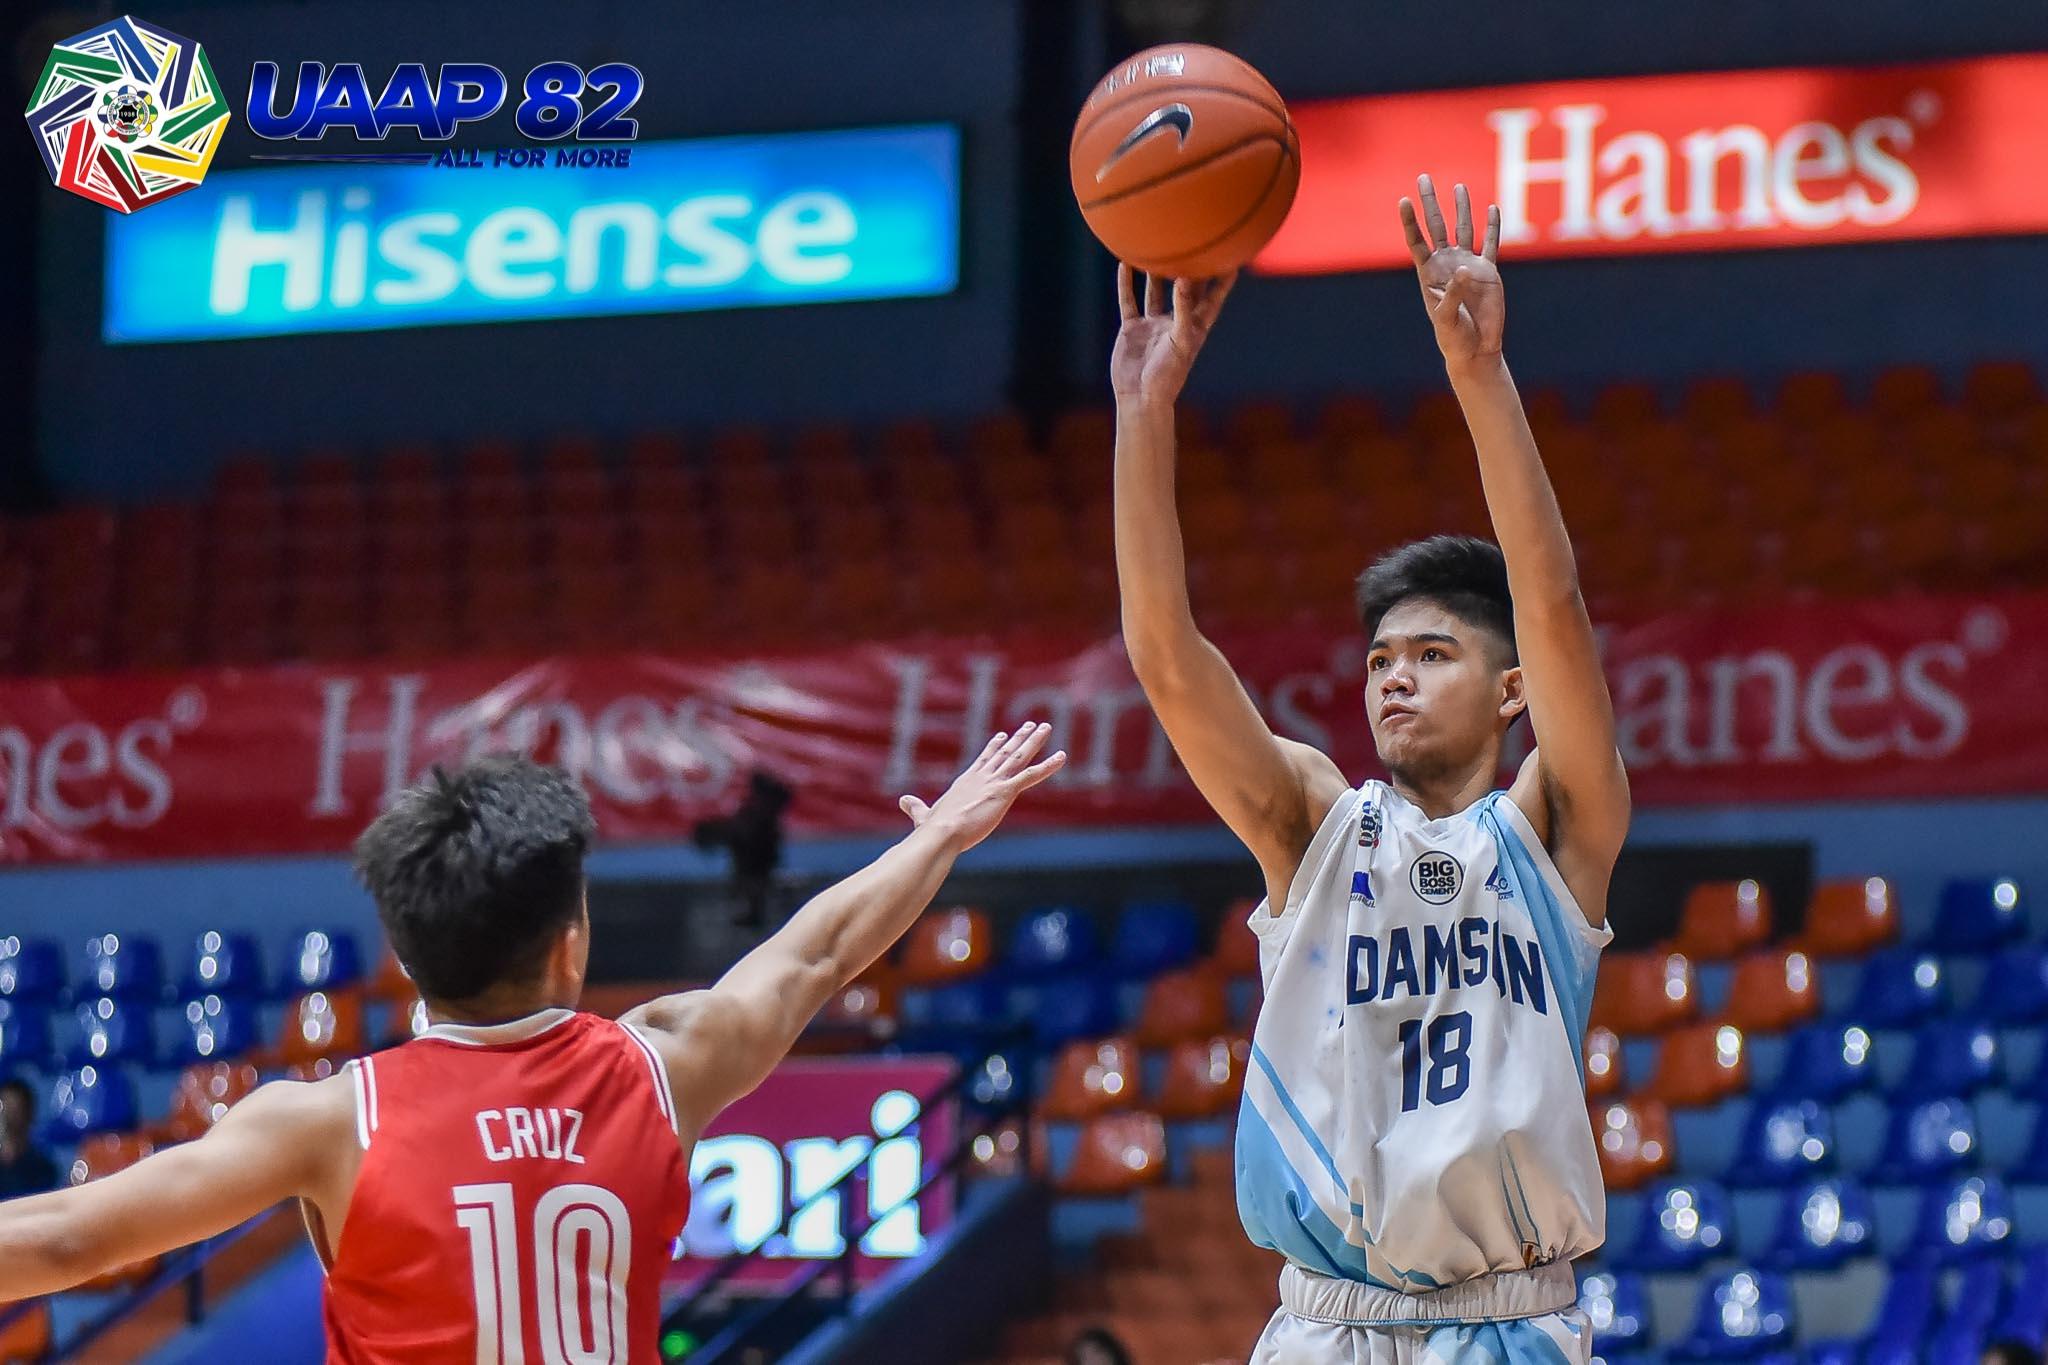 UAAP-82-Jrs-Basketball-ADU-vs.-UE-Erolon-0040 NU-NS Bullpups move to verge of UAAP 82 Boys' Basketball elims sweep ADMU AdU Basketball DLSU FEU News NU UAAP UE UP UST  - philippine sports news